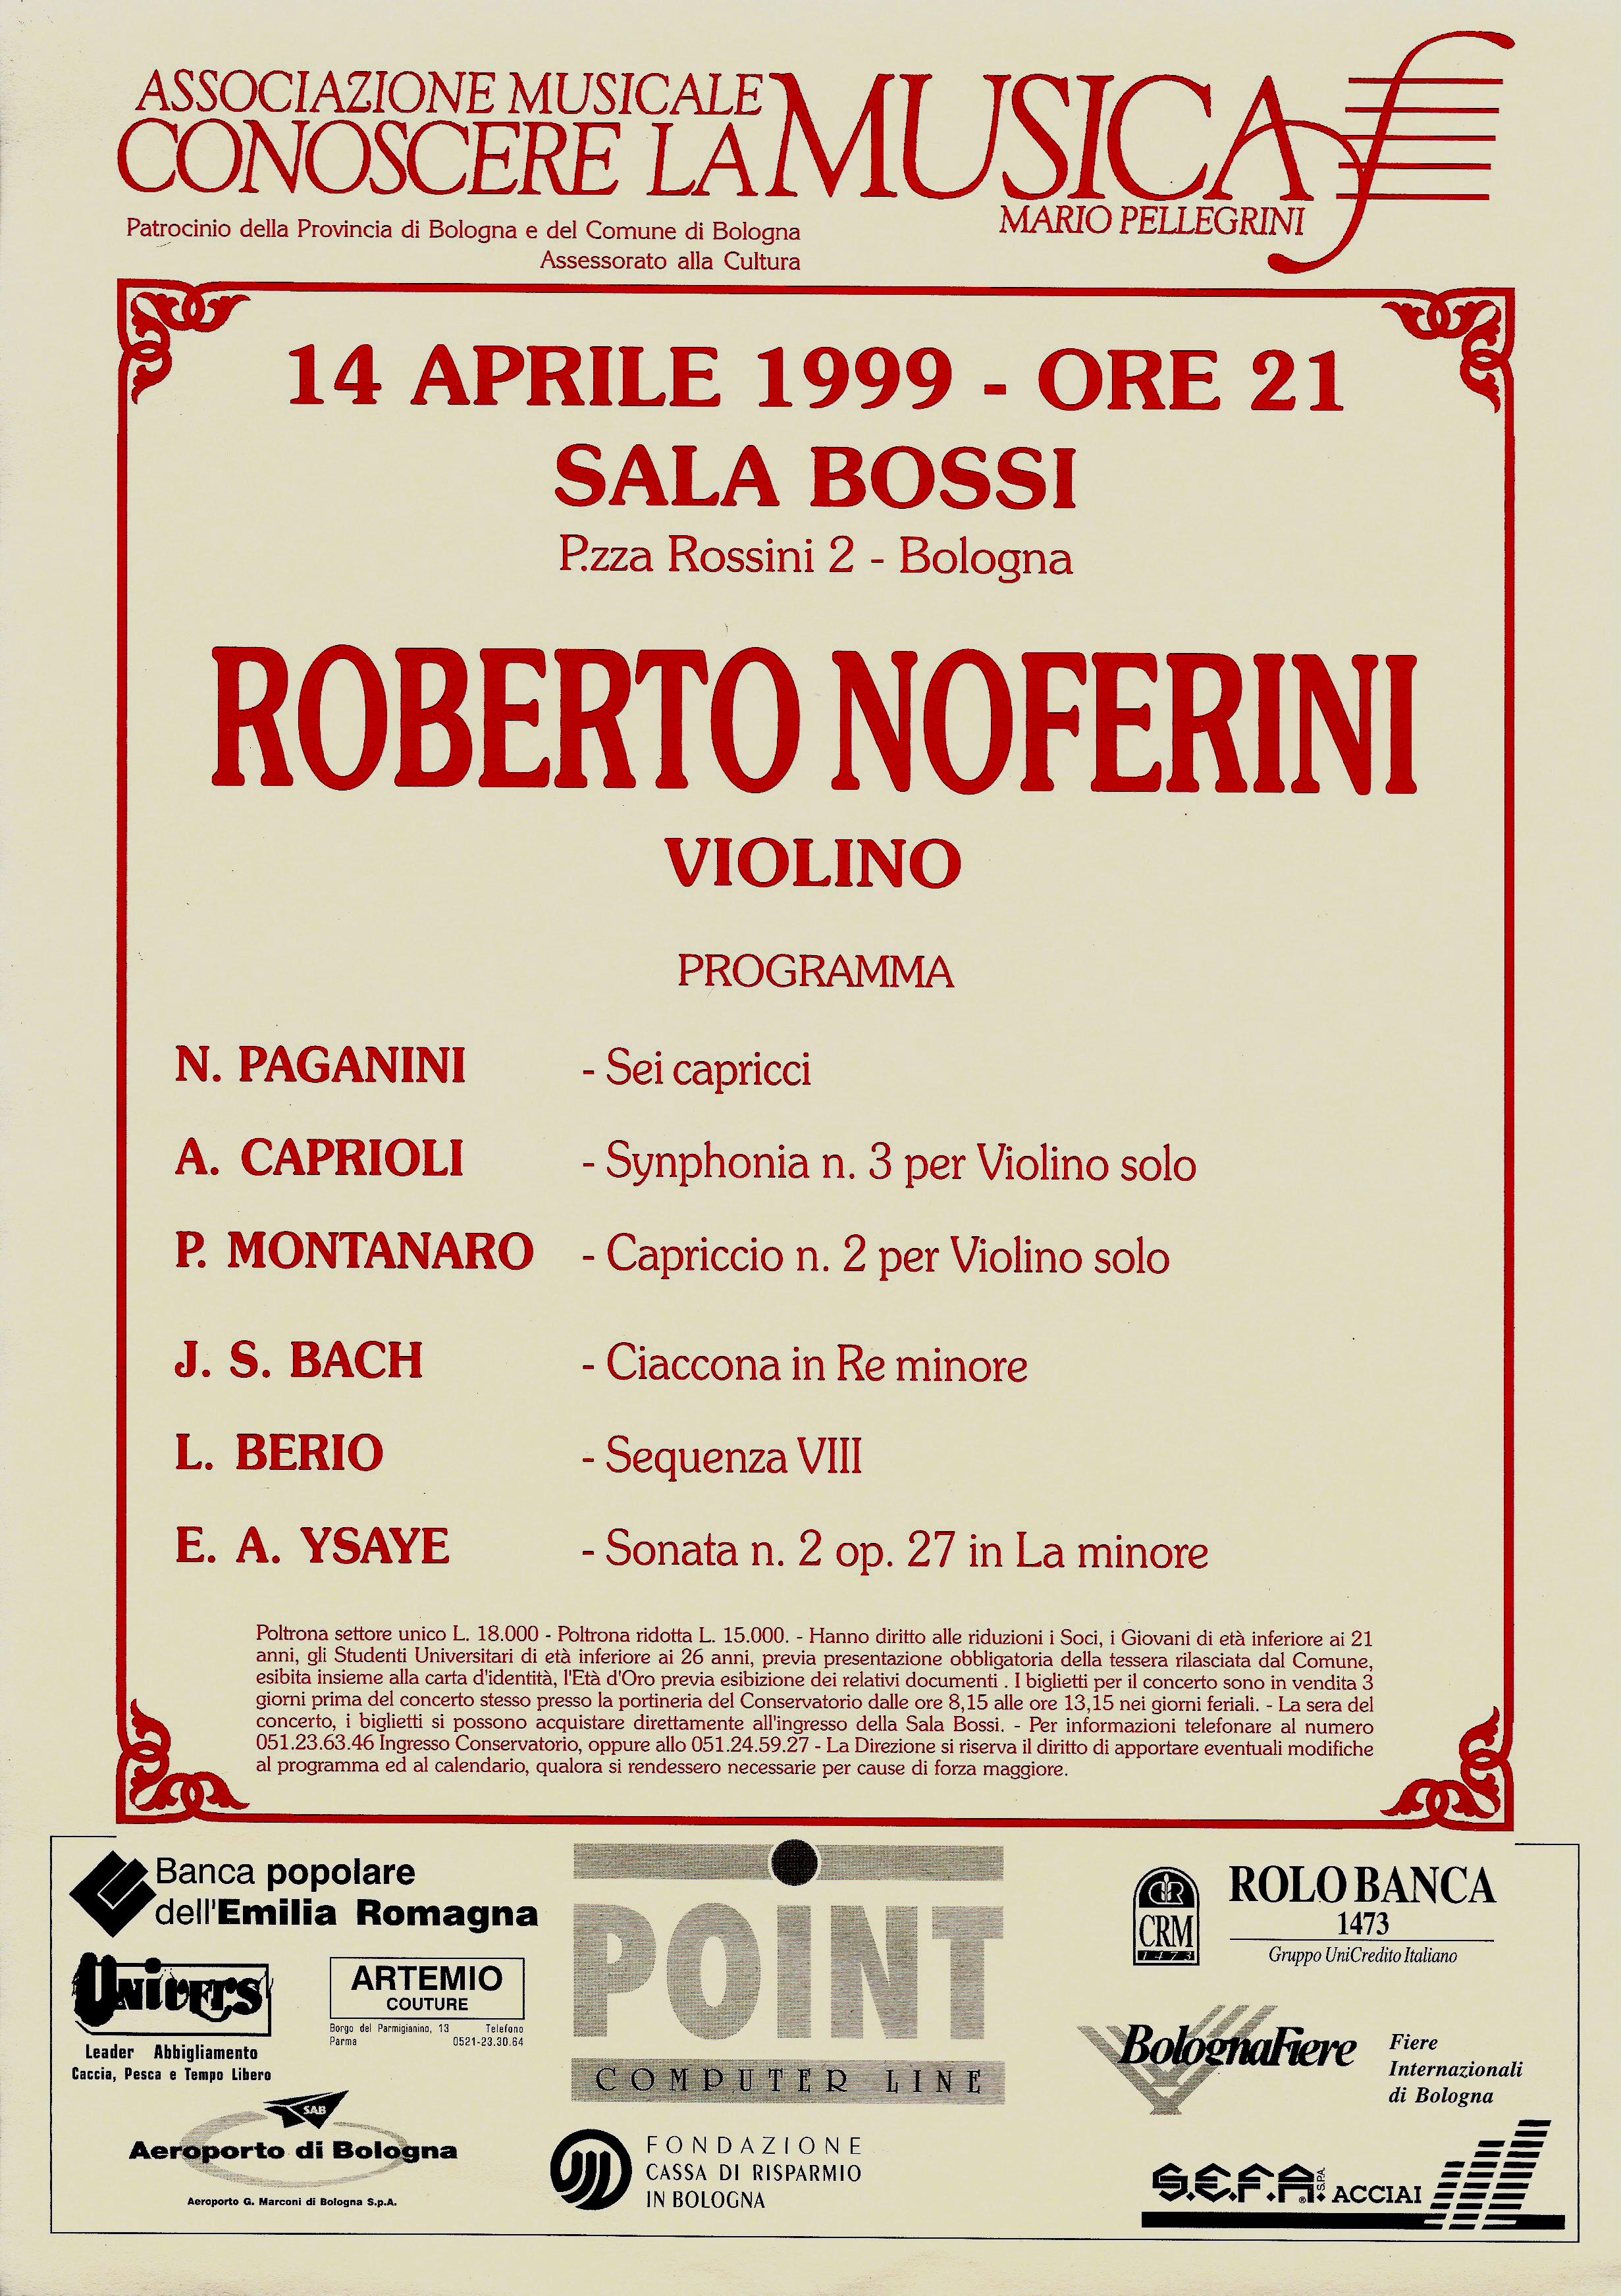 ROBERTO NOFERINI plays Alberto Caprioli, Symphonia III